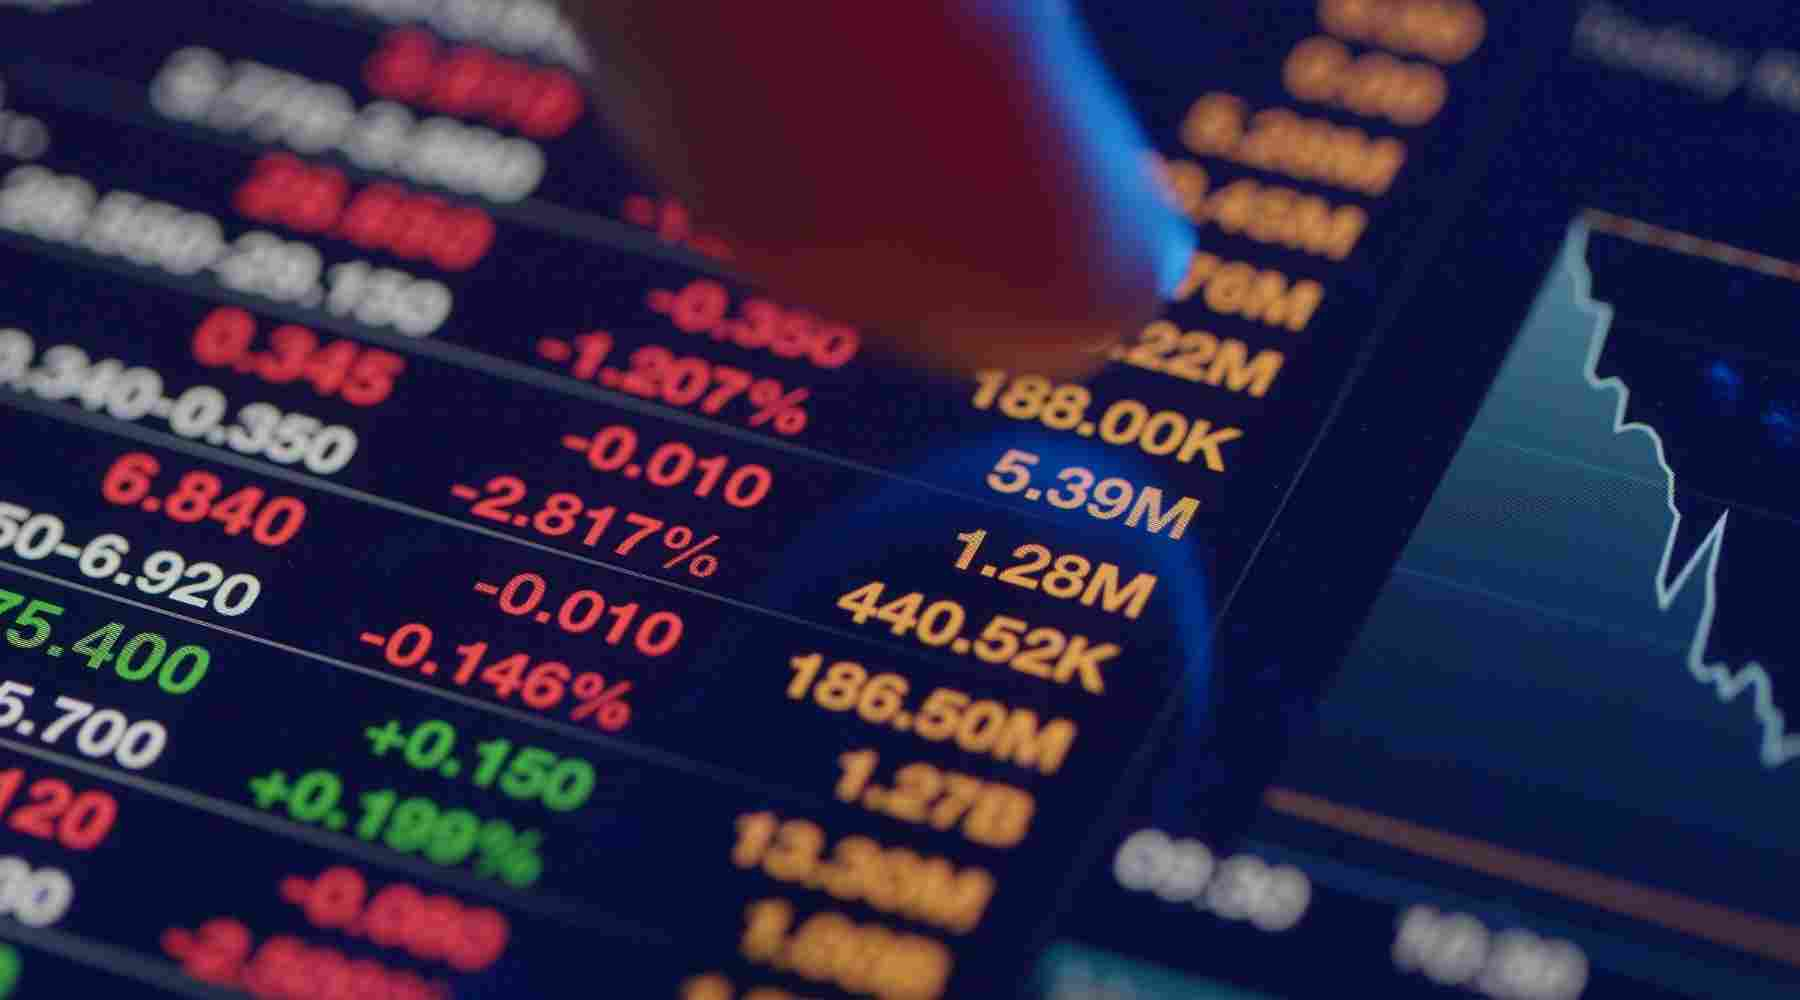 How to turn 10k into 100k - stock market